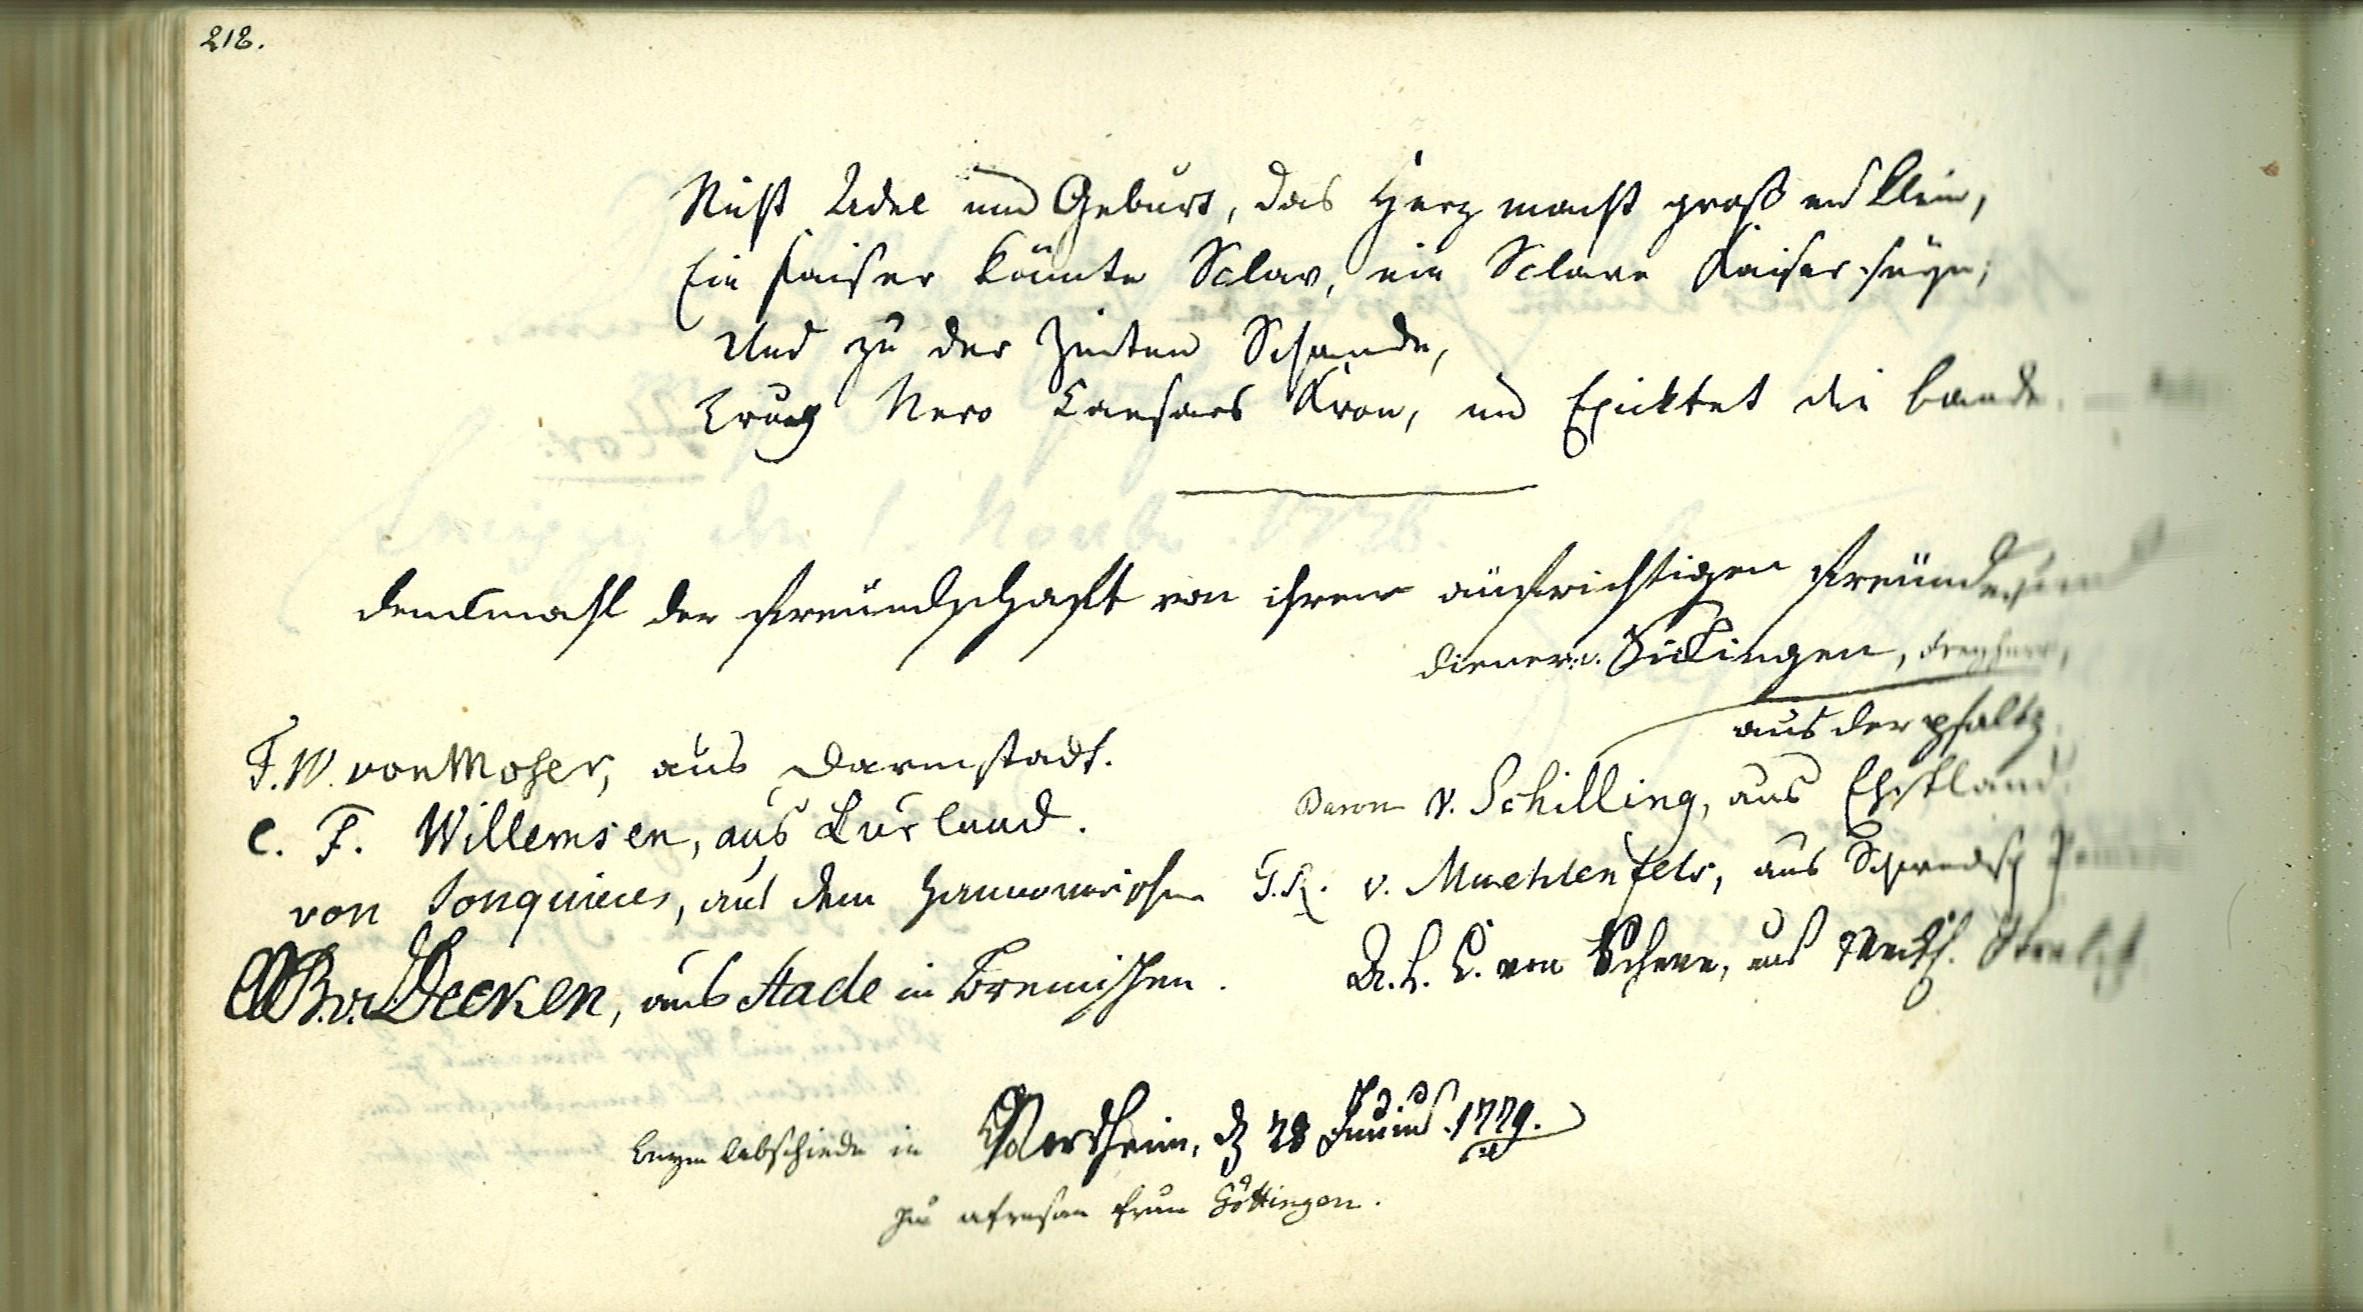 Stammbuch CL Kämpe 28th june 1779.jpg